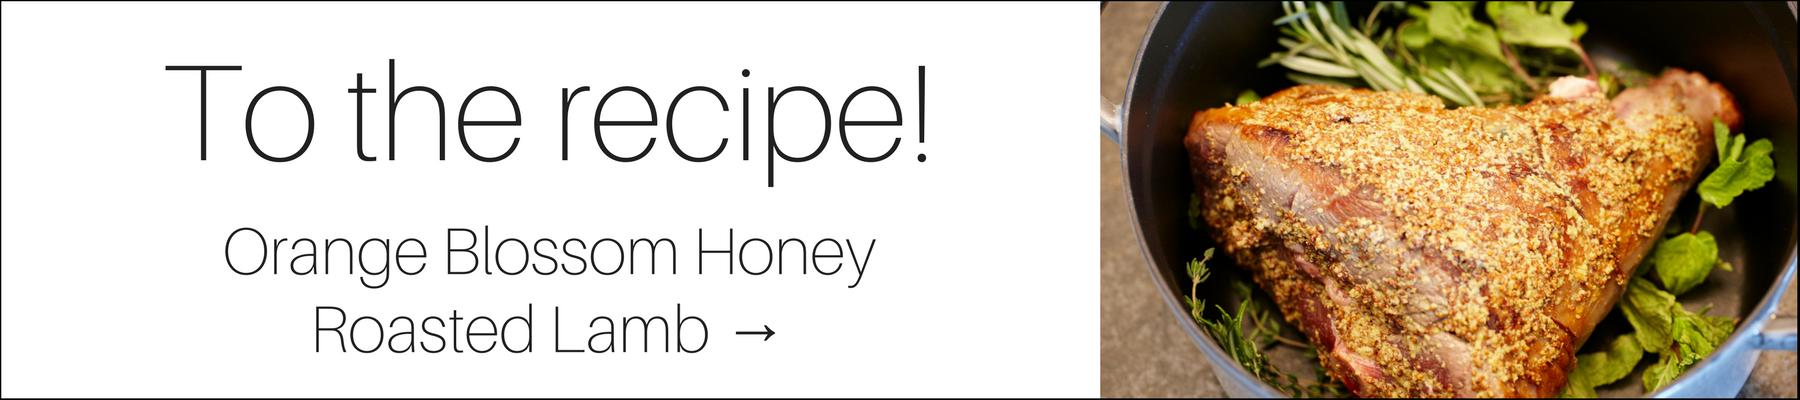 To the recipe! Orange Blossom Honey Roasted Lamb ->